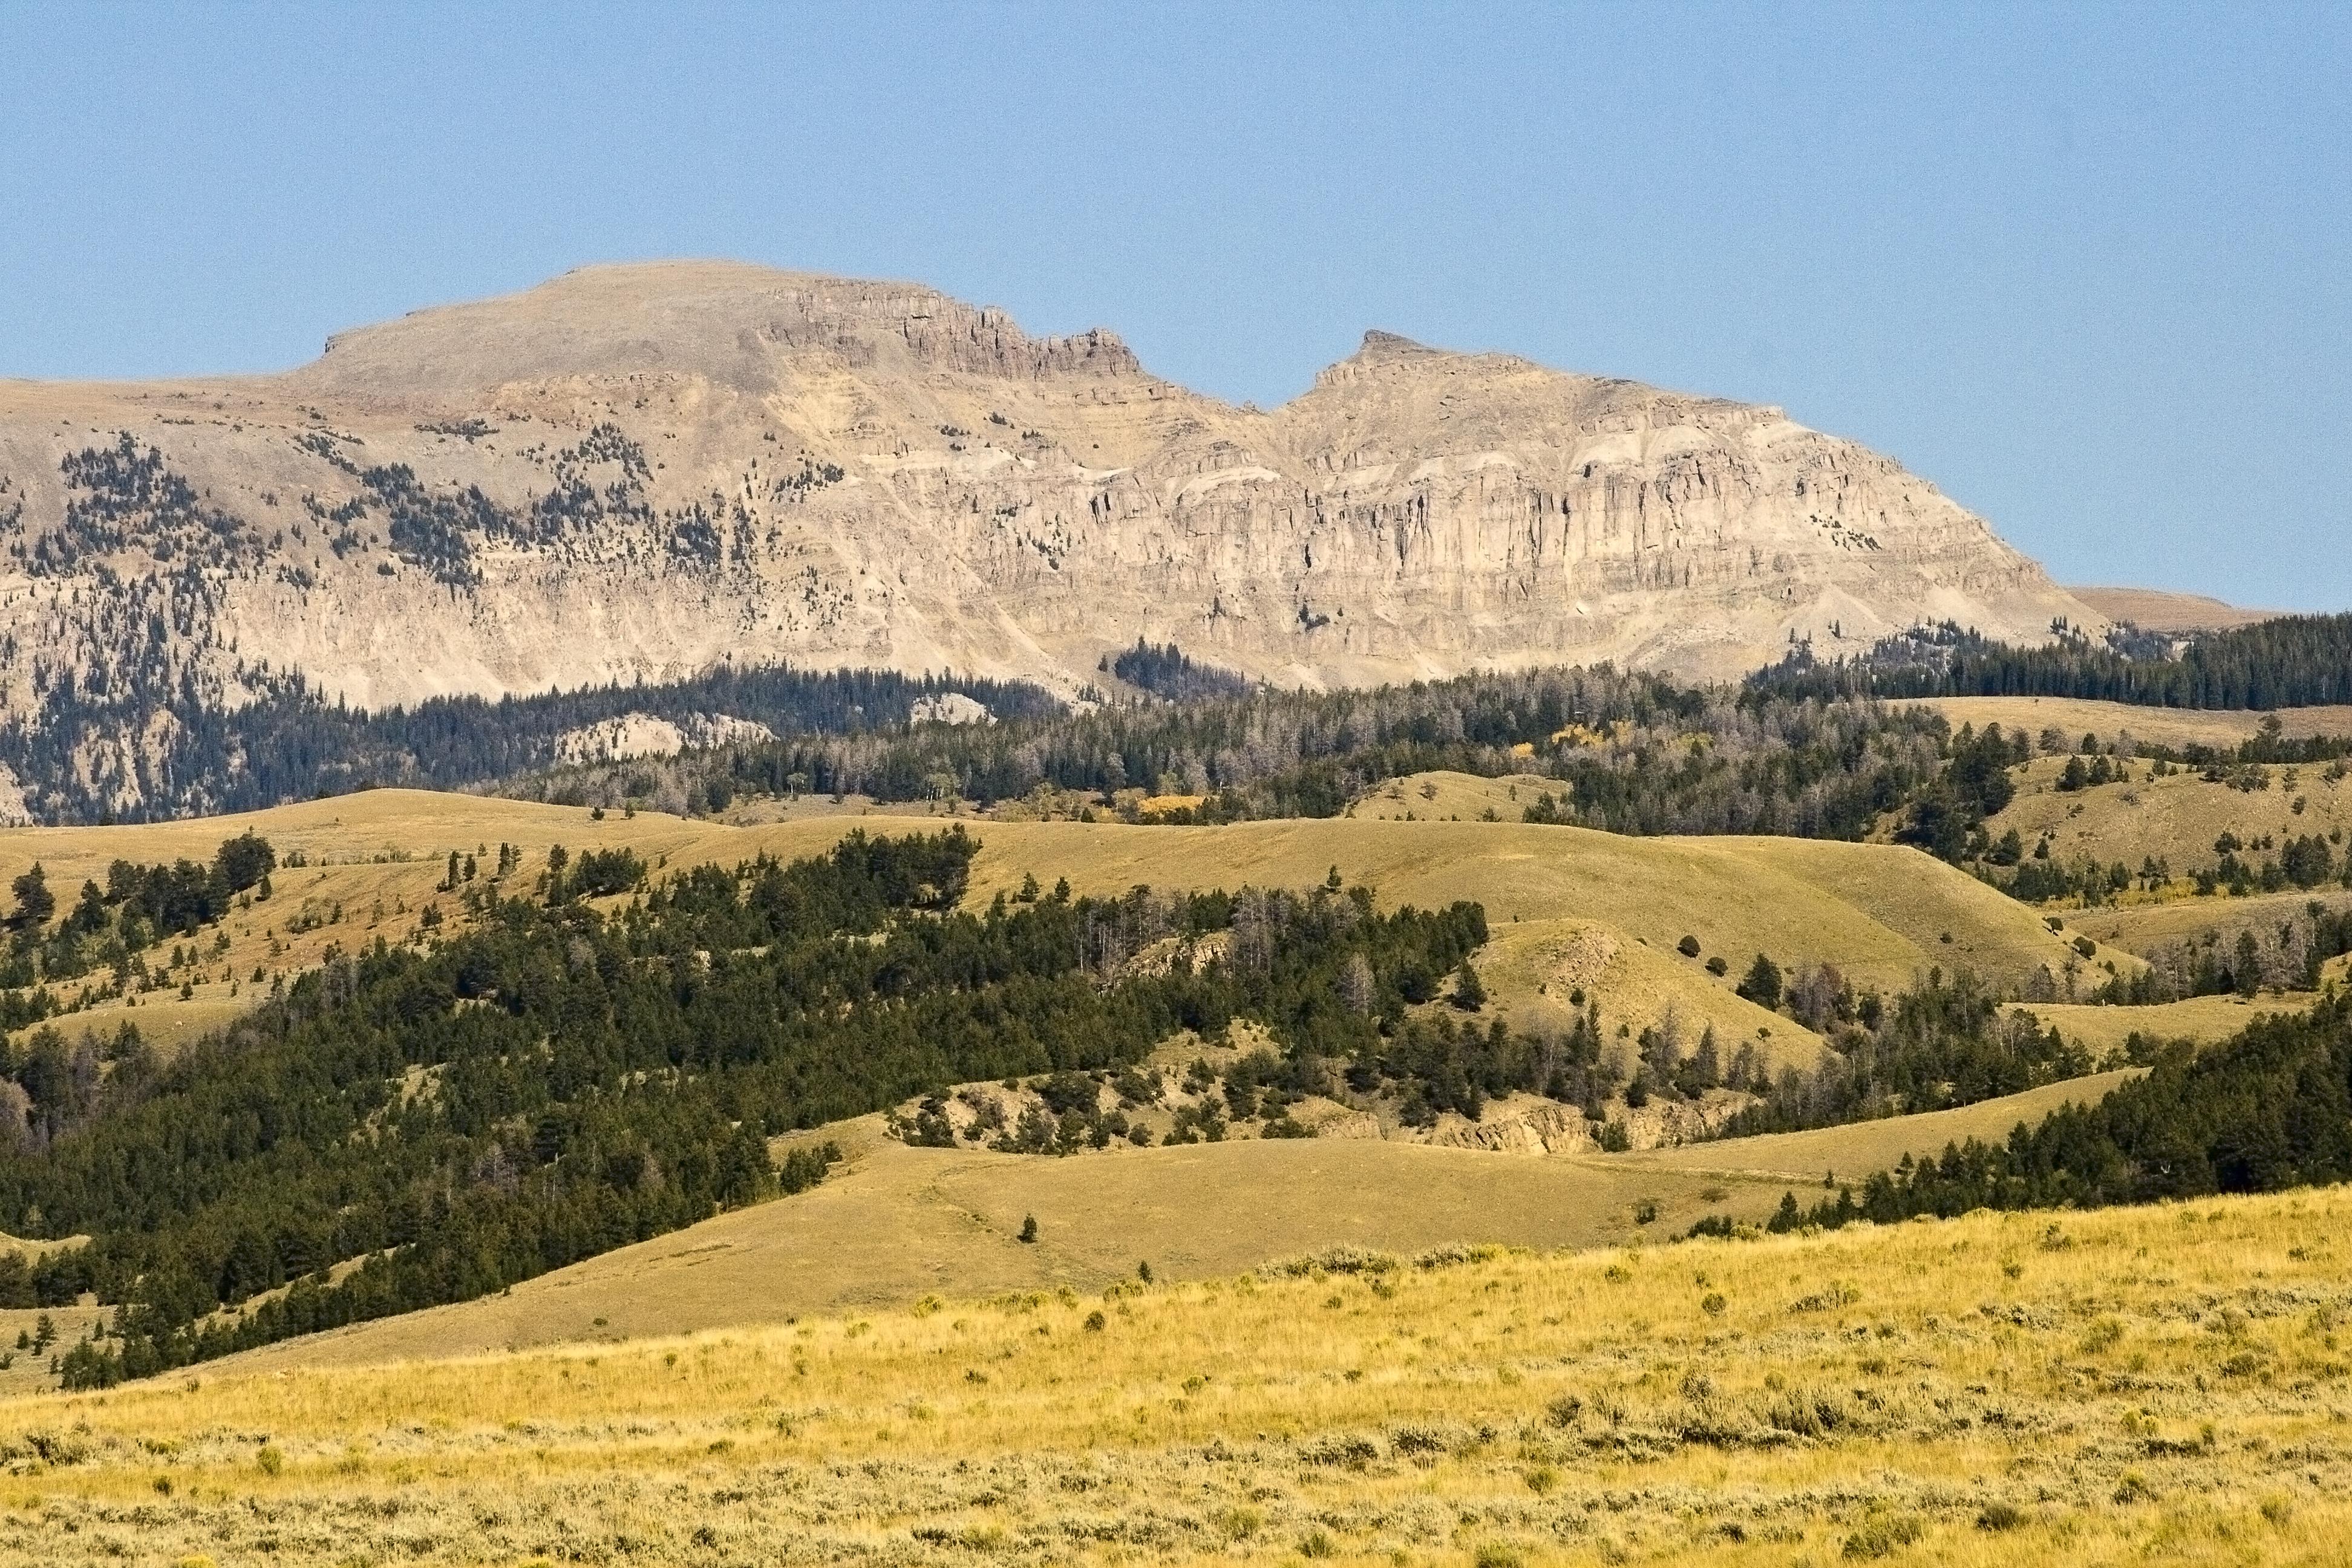 File:Sheep Mountain Jackson WY1.jpg - Wikimedia Commons